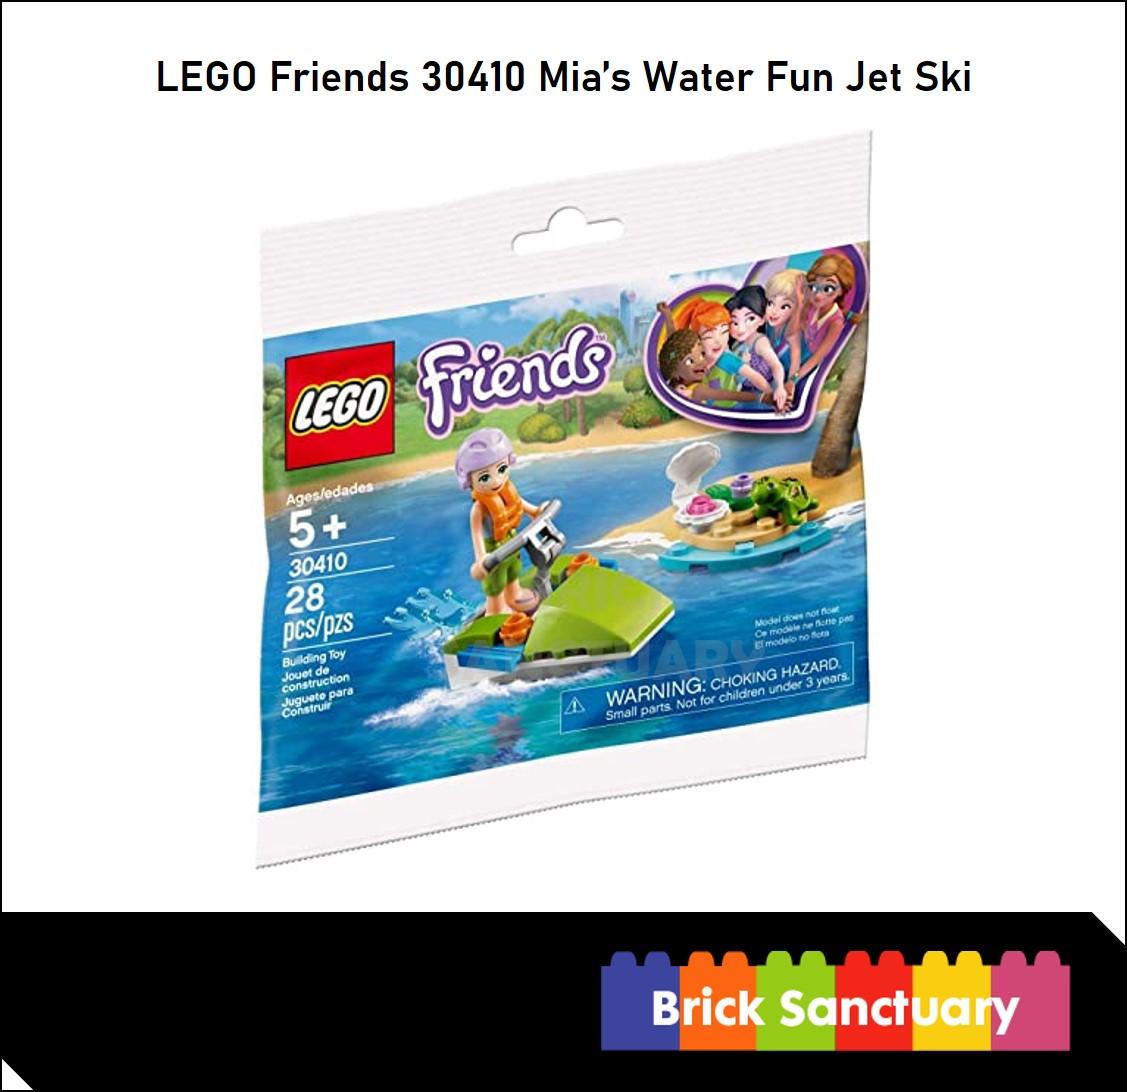 LEGO 30410 : Friends Mia's Water Fun Jet Ski